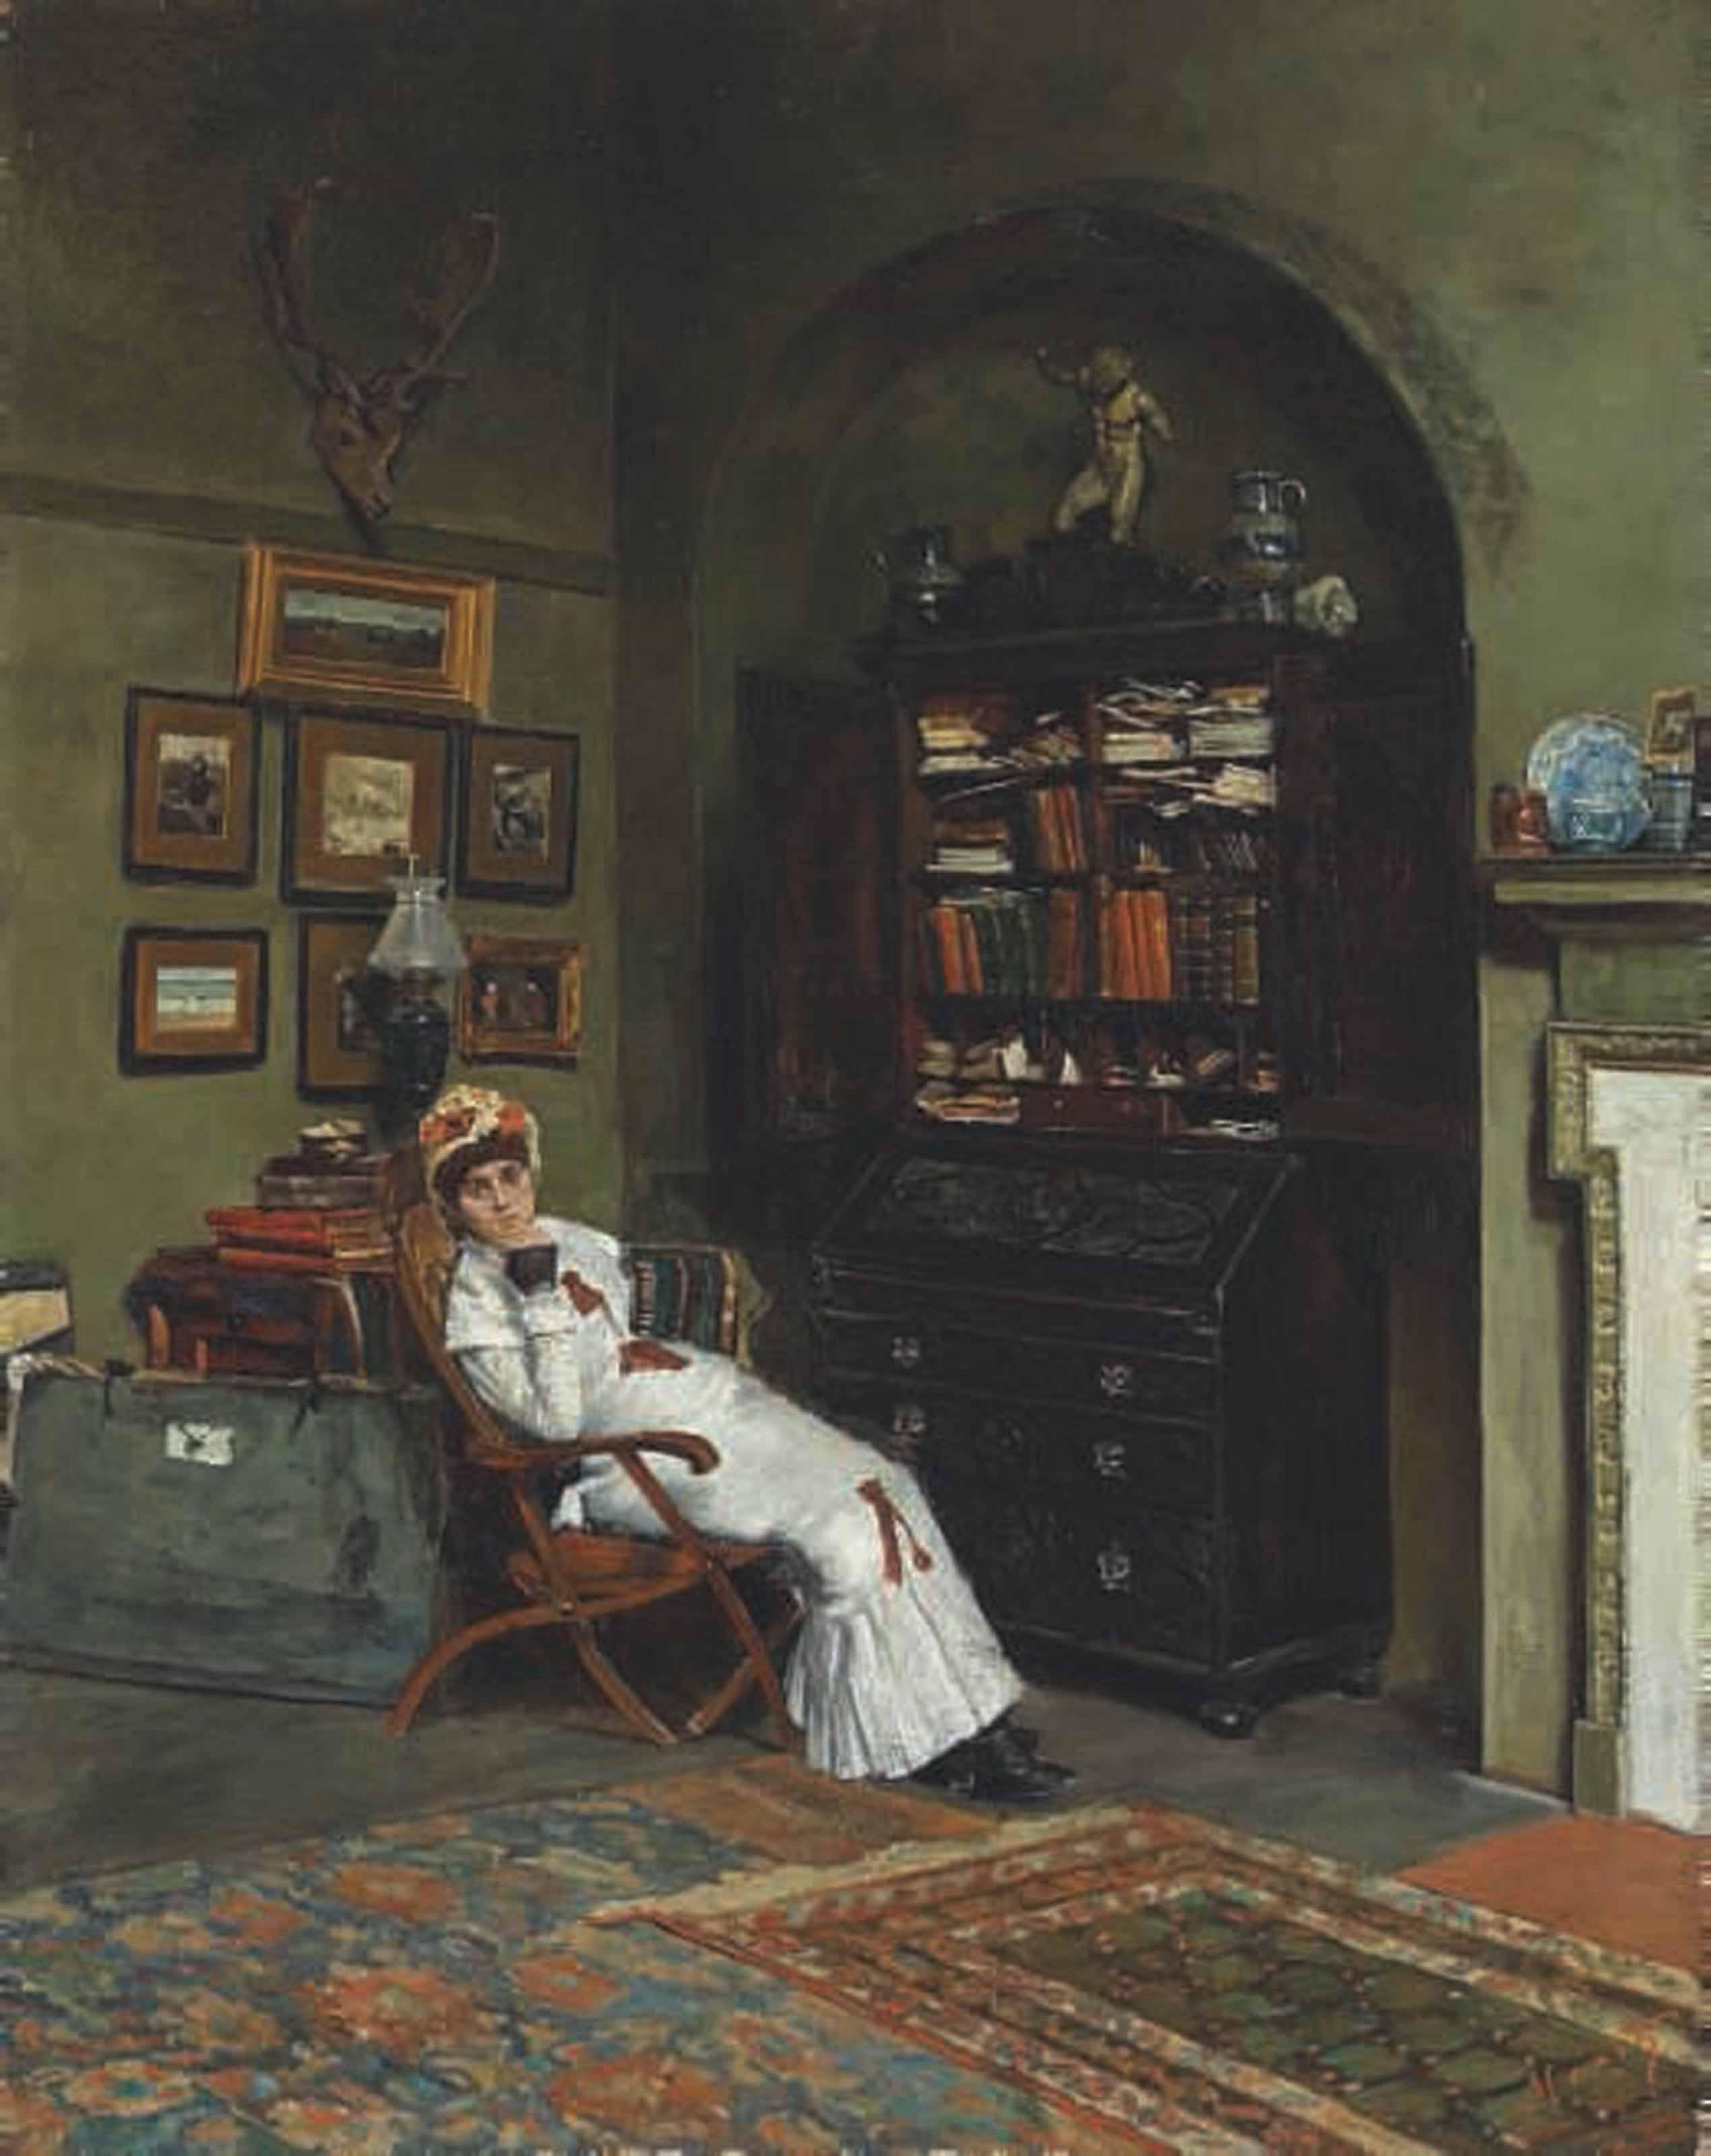 Portrait of Esther Kenworthy Waterhouse in the artist's studio, Primrose Hill